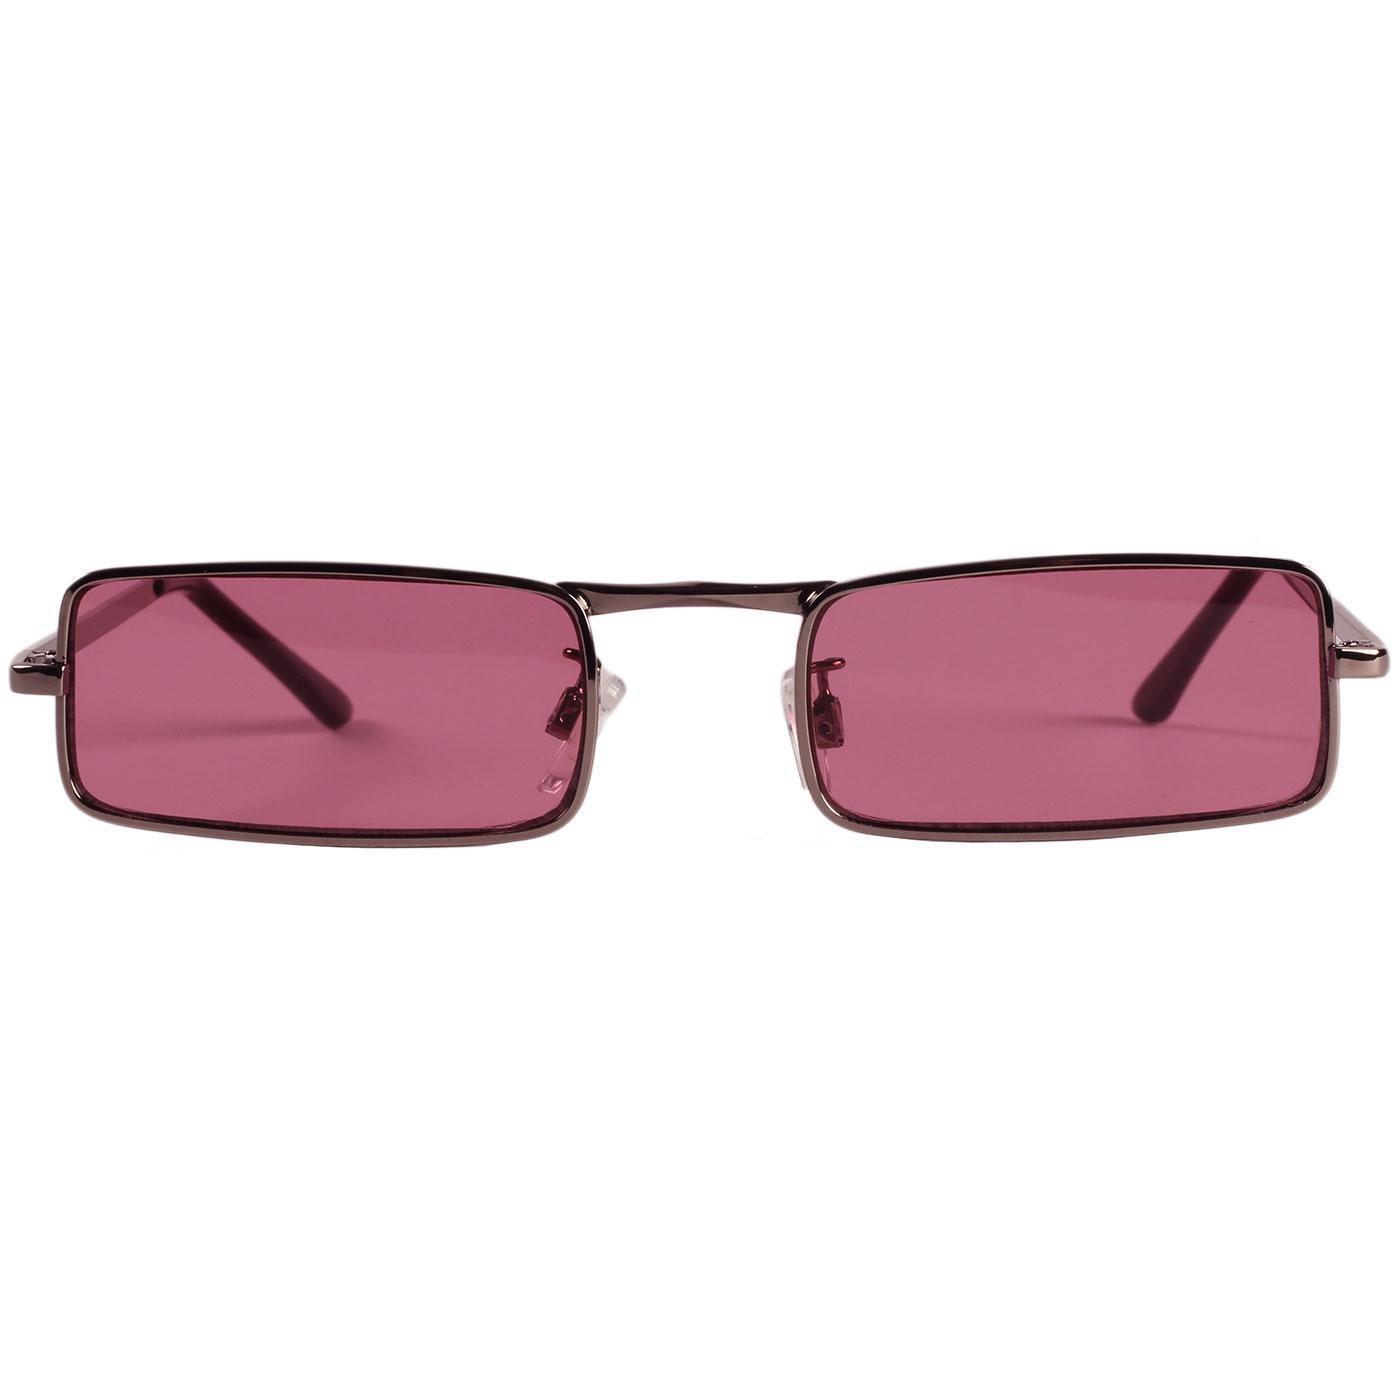 Madcap England Mod 60s McGuinn Granny Glasses Sunglasses in Pink